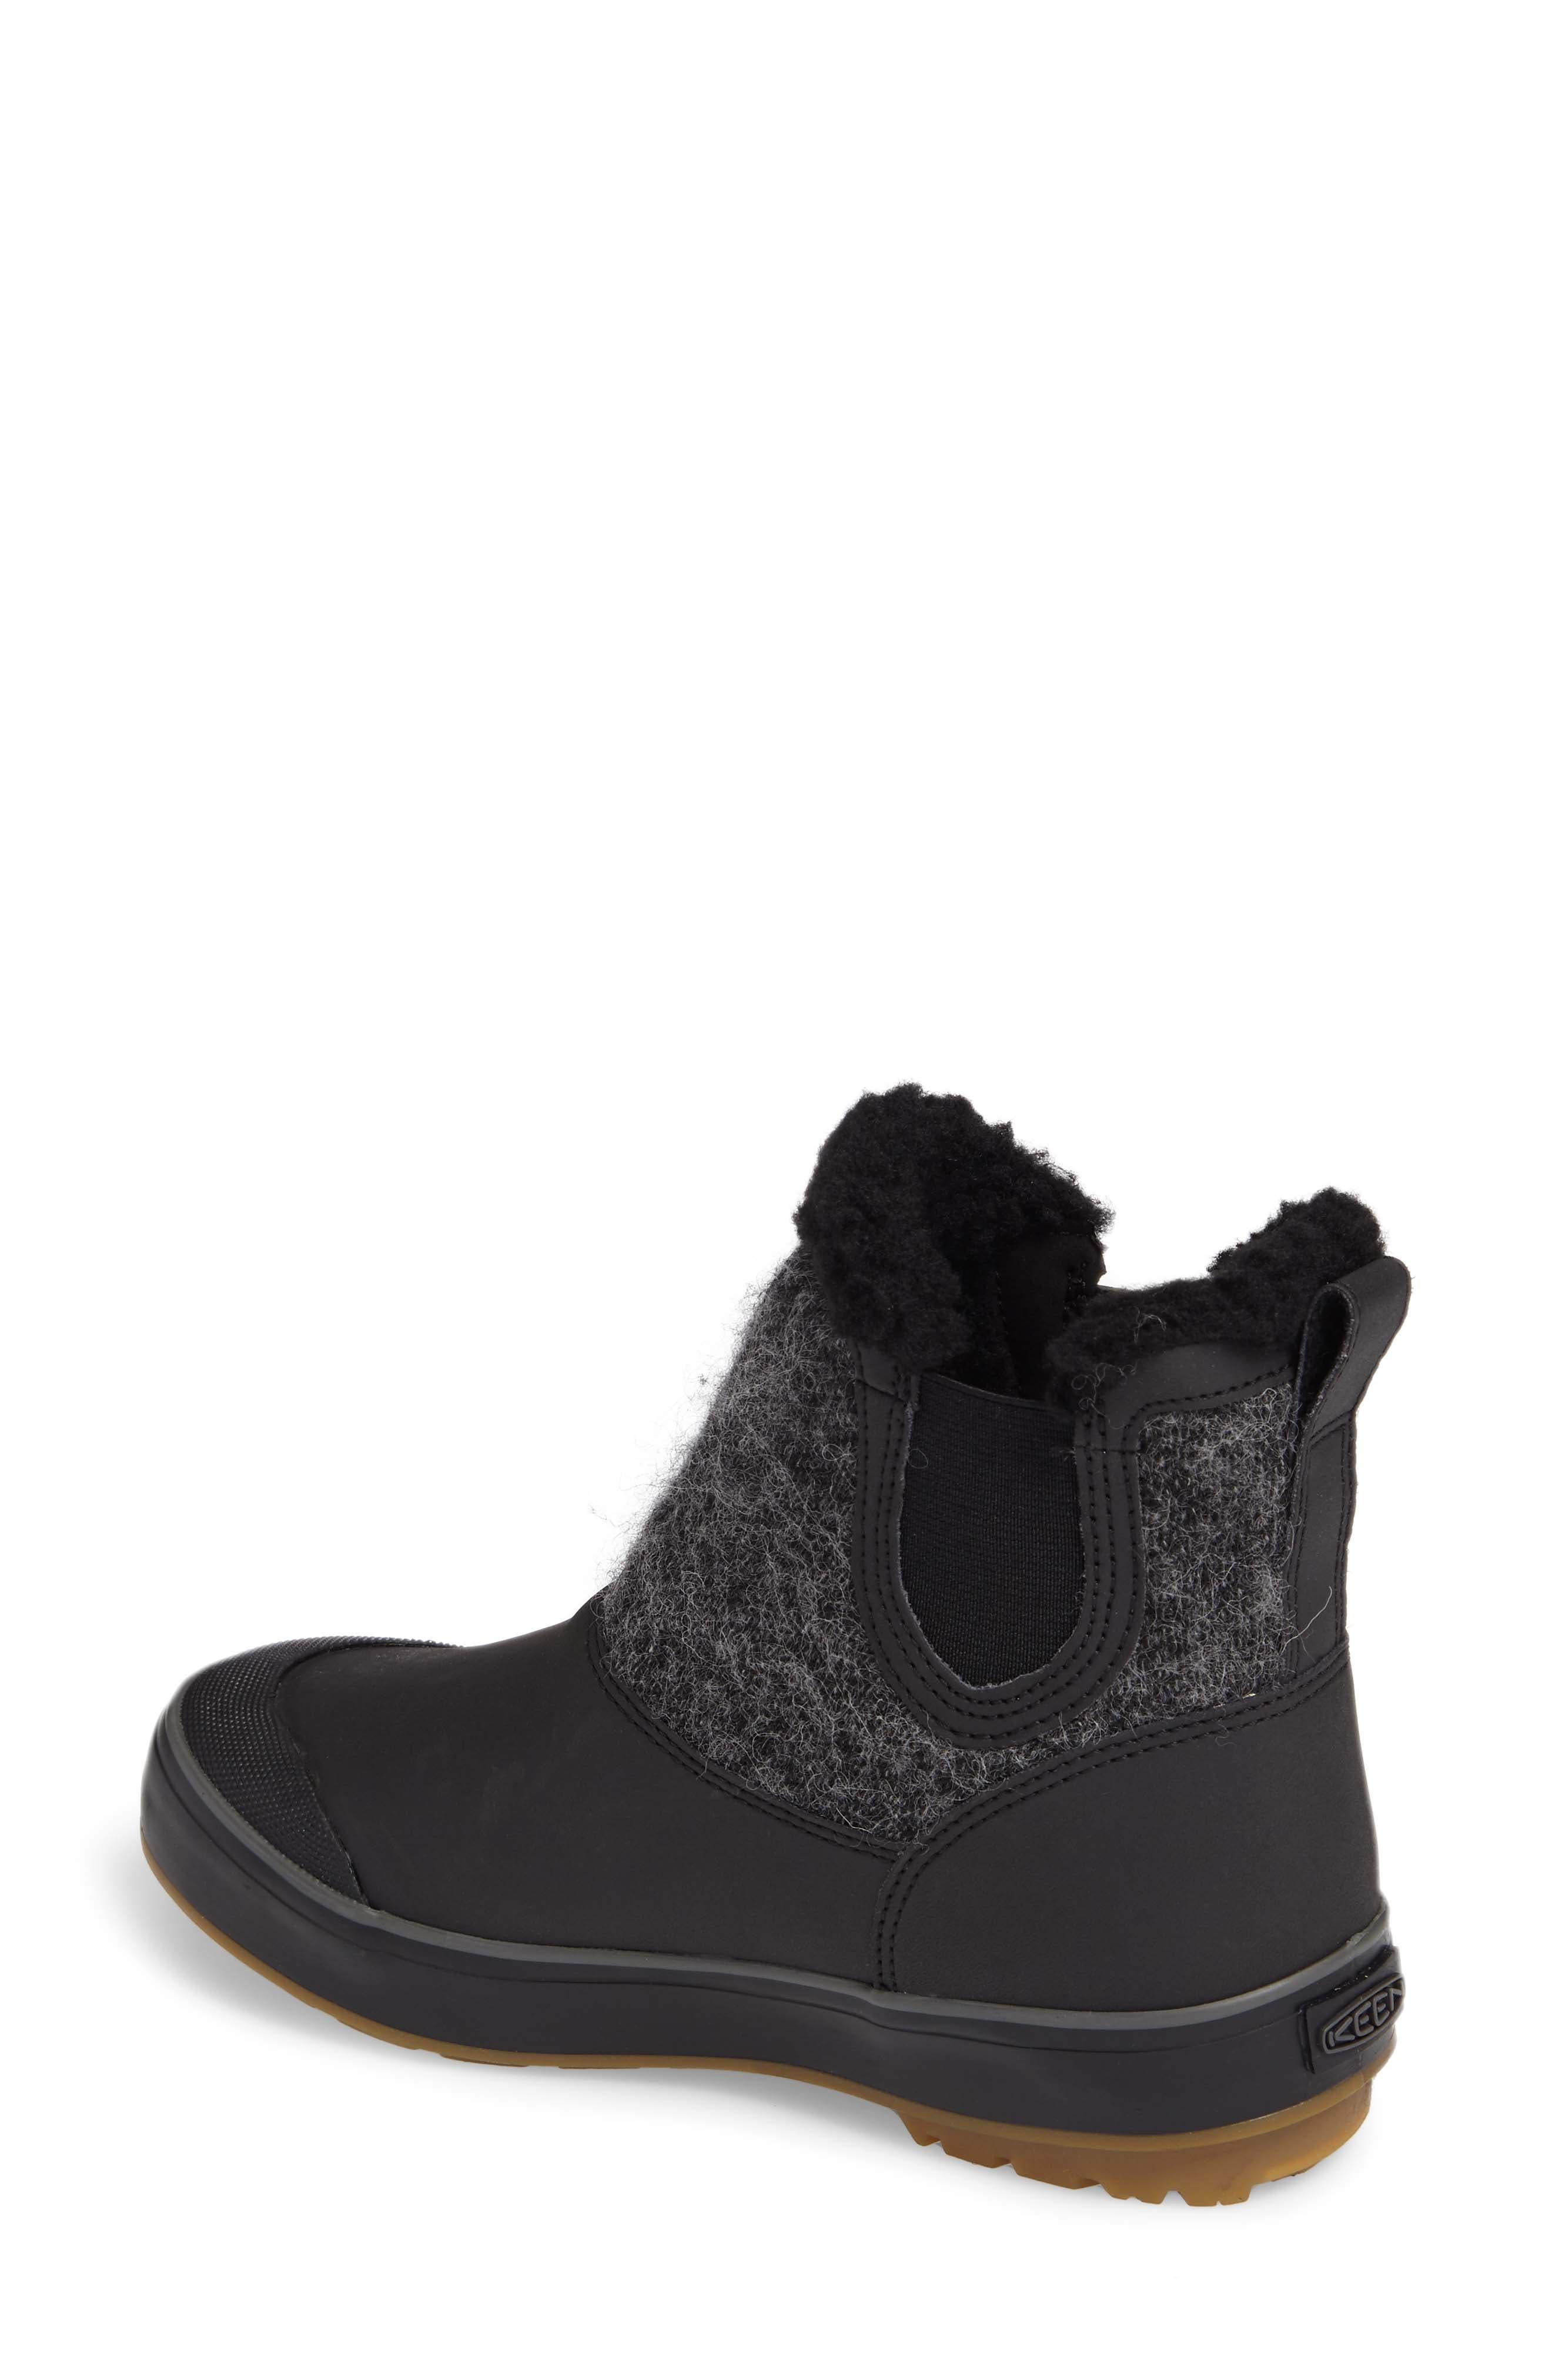 Elsa Chelsea Waterproof Faux Fur Lined Boot,                             Alternate thumbnail 2, color,                             Black Wool Leather